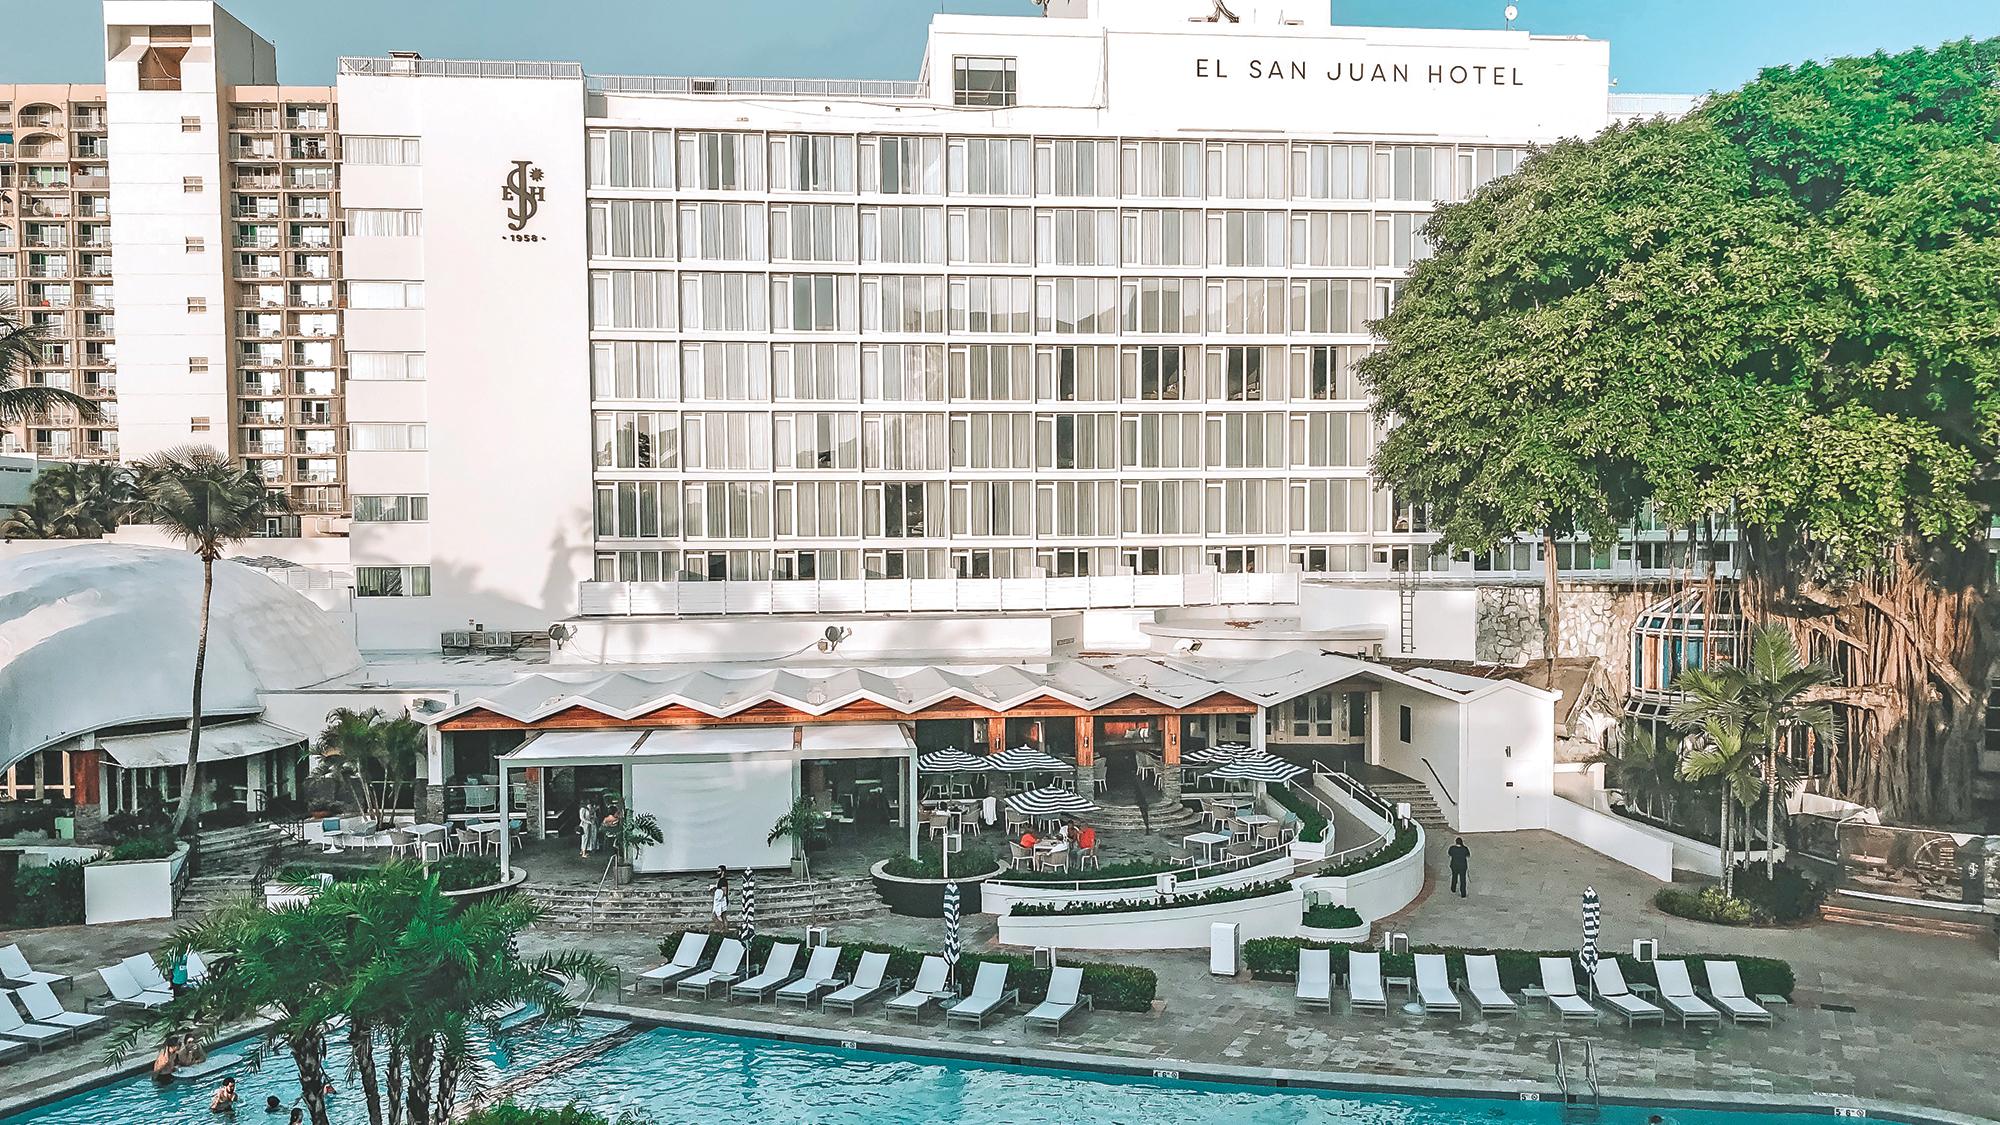 El san juan and casino waldorf astoria collection hotel lopesan costa meloneras resort corallium spa and casino playa meloneras gran canaria